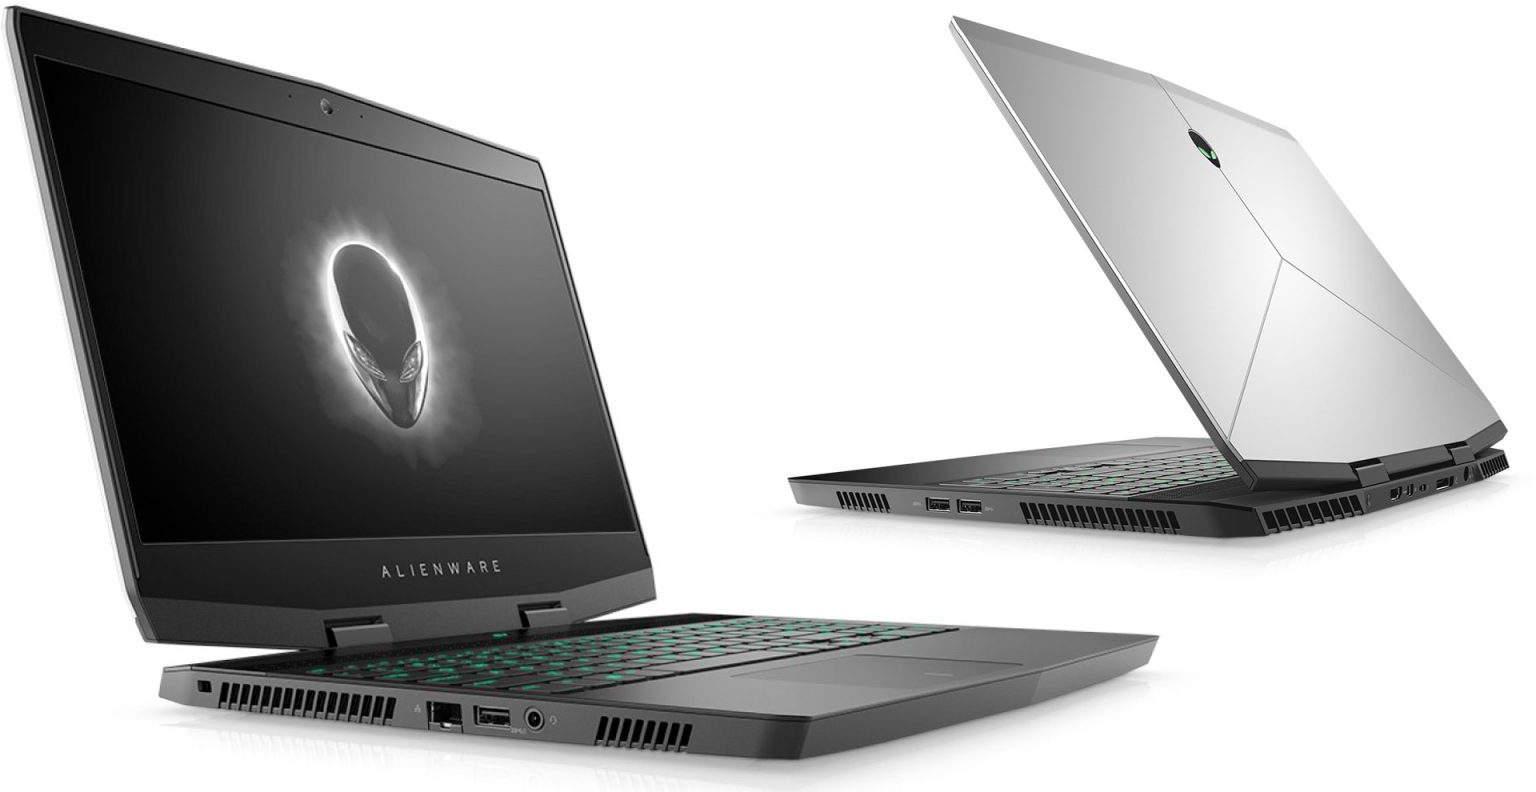 Купить Ноутбук Dell Alienware M15 (M15-5928) фото 3